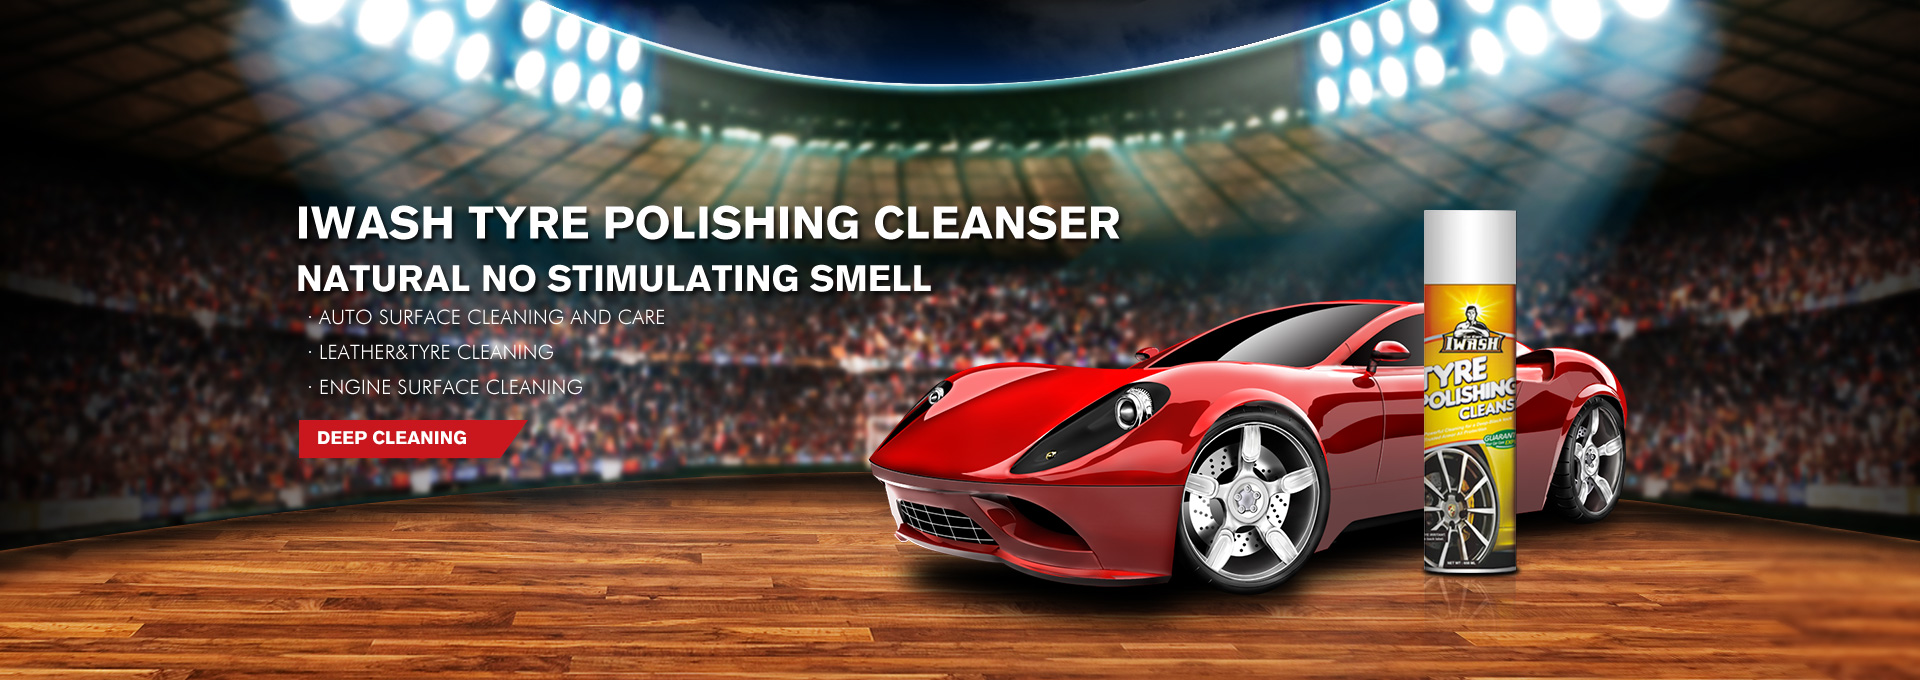 Tyre Polishing Cleanser 650ml IWASH